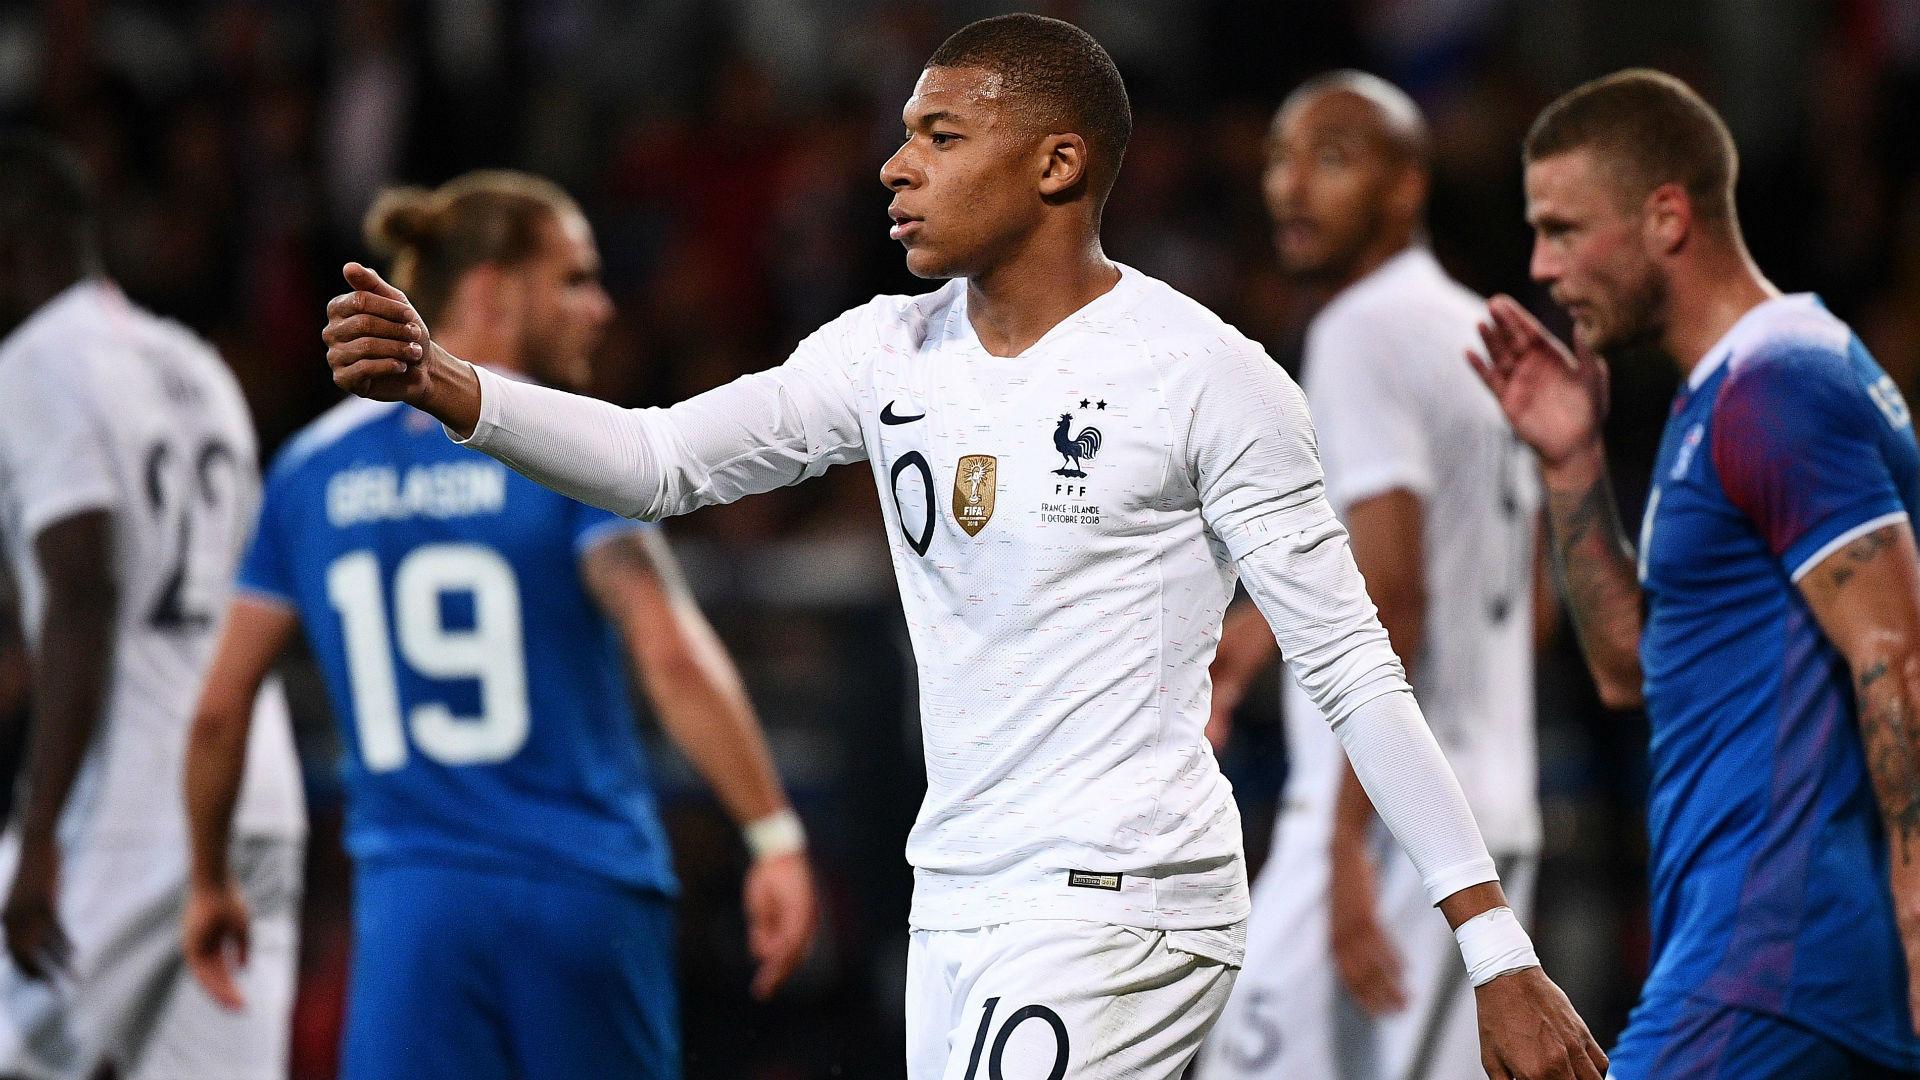 France vs Islande en direct live : Stats, Compo, Détails - 25 Mars 2019